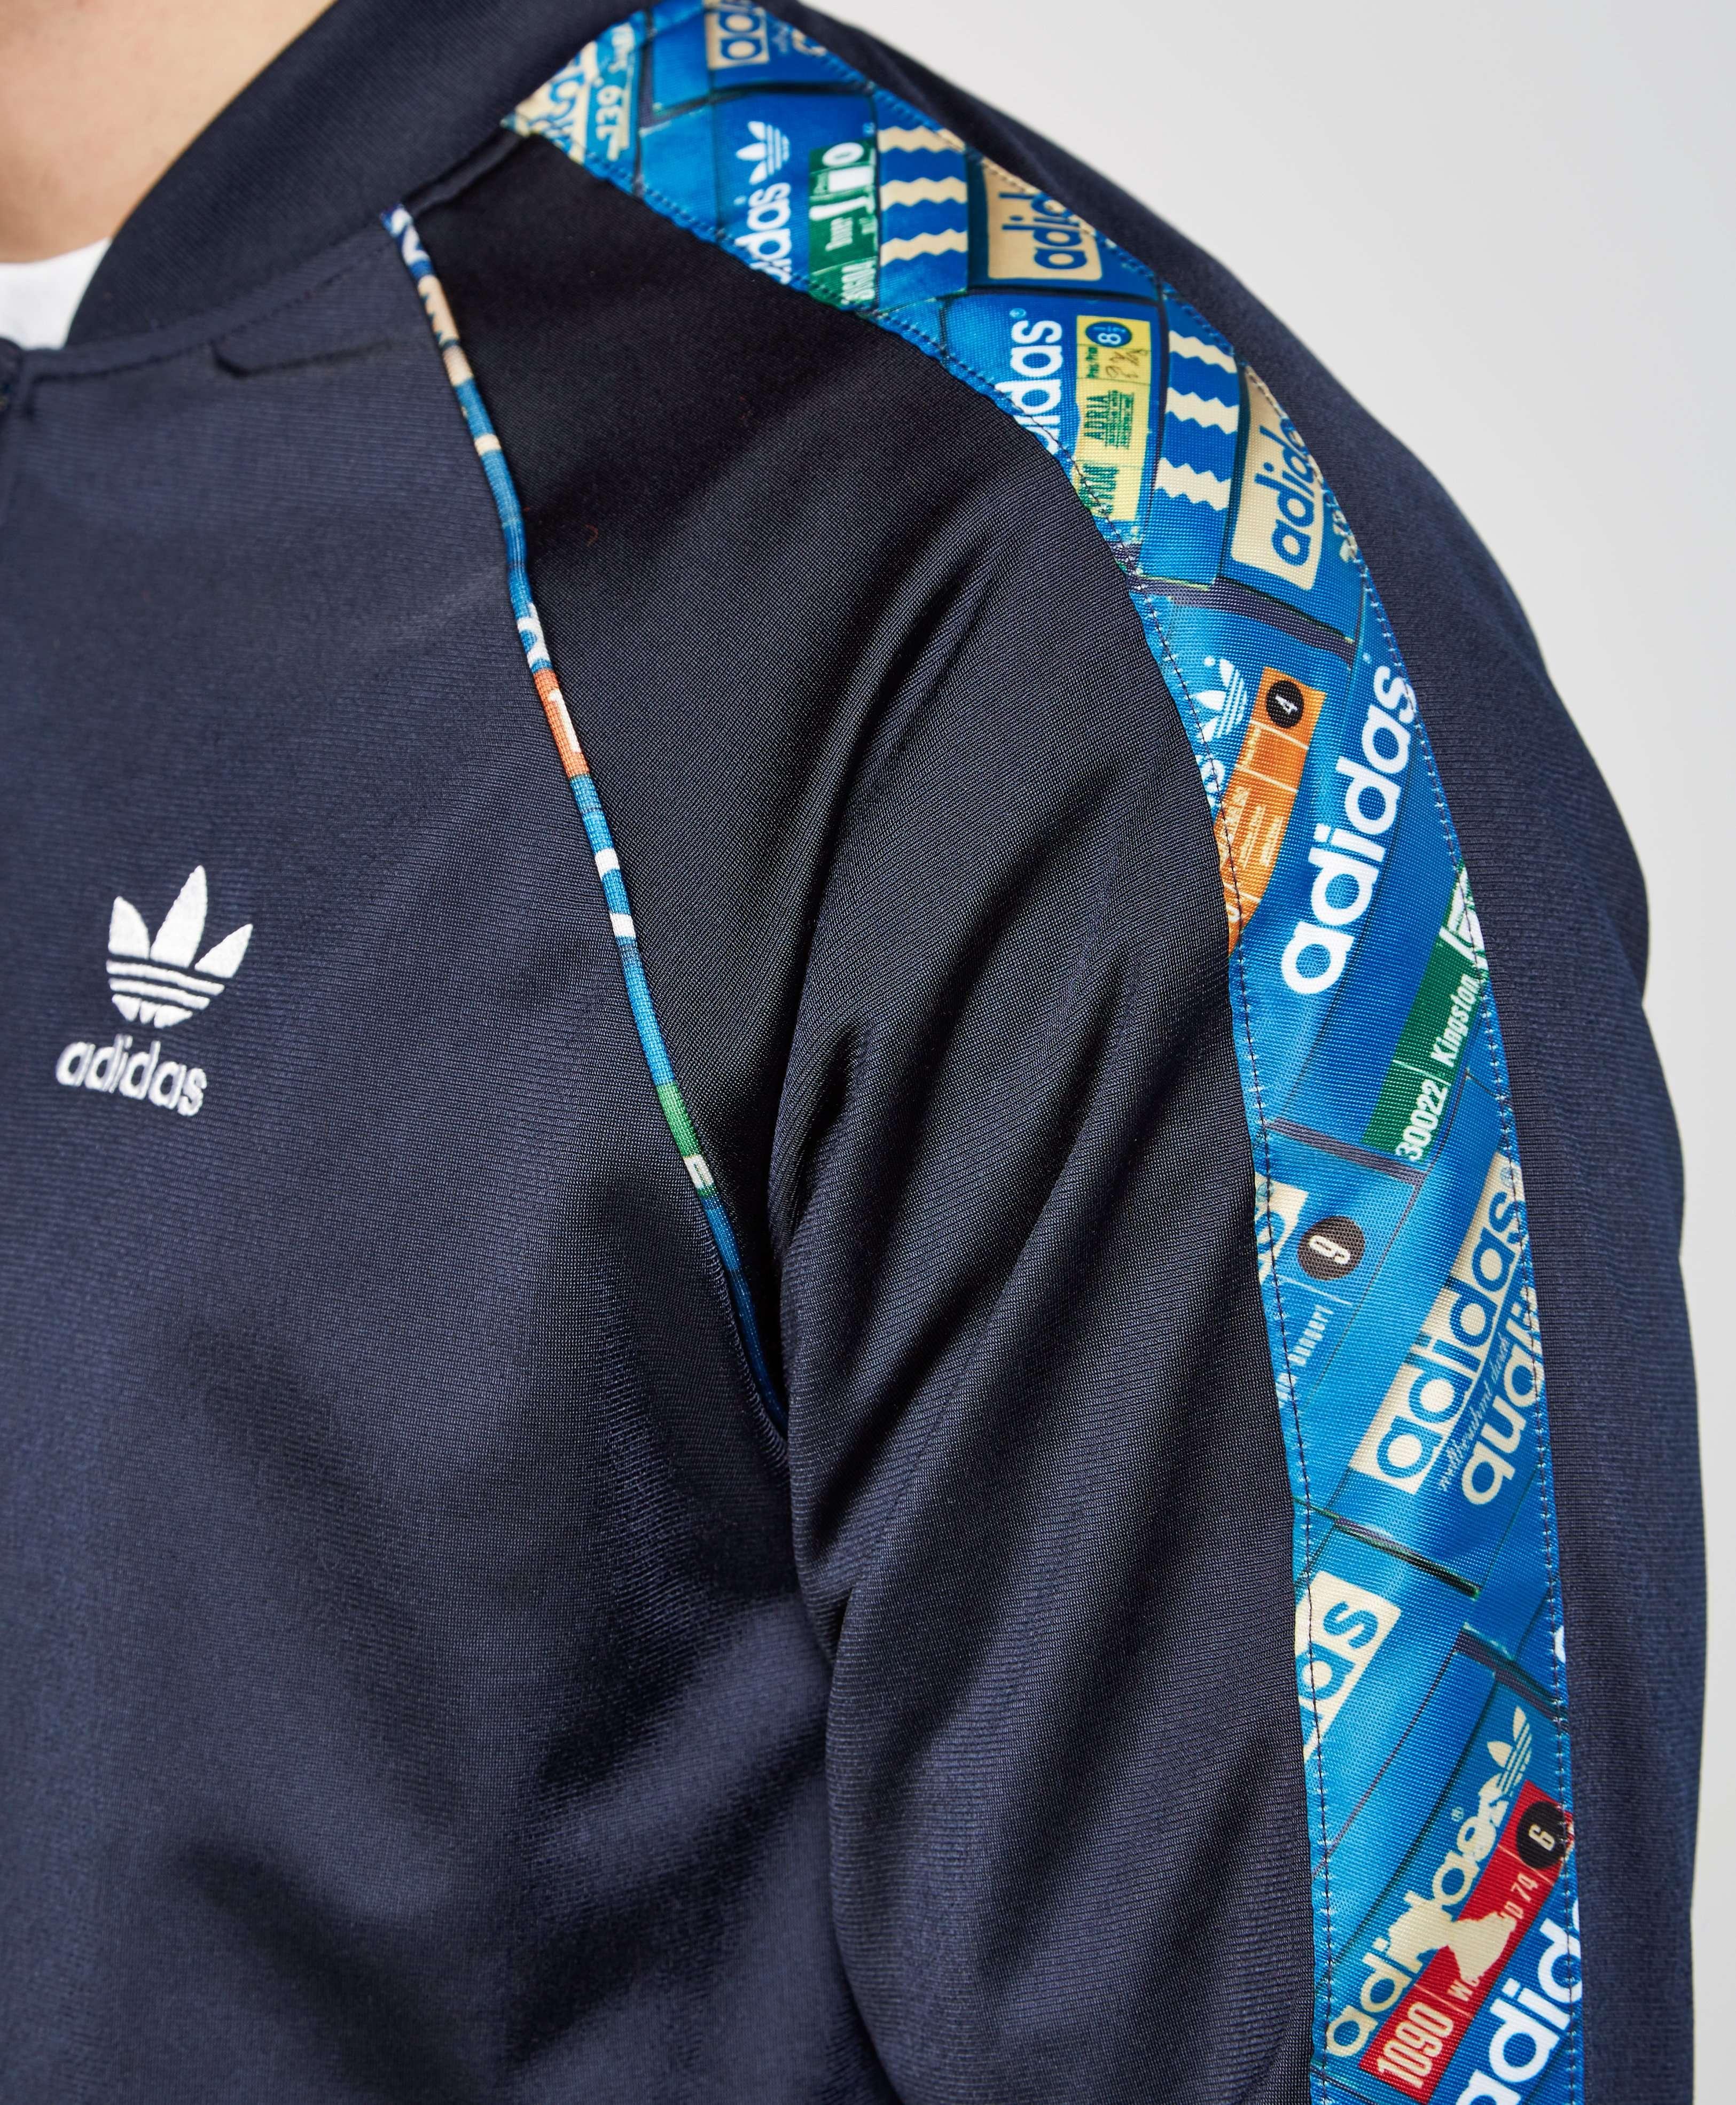 Adidas Originals Trefoil Shoebox Reversible Track Top Scotts Menswear